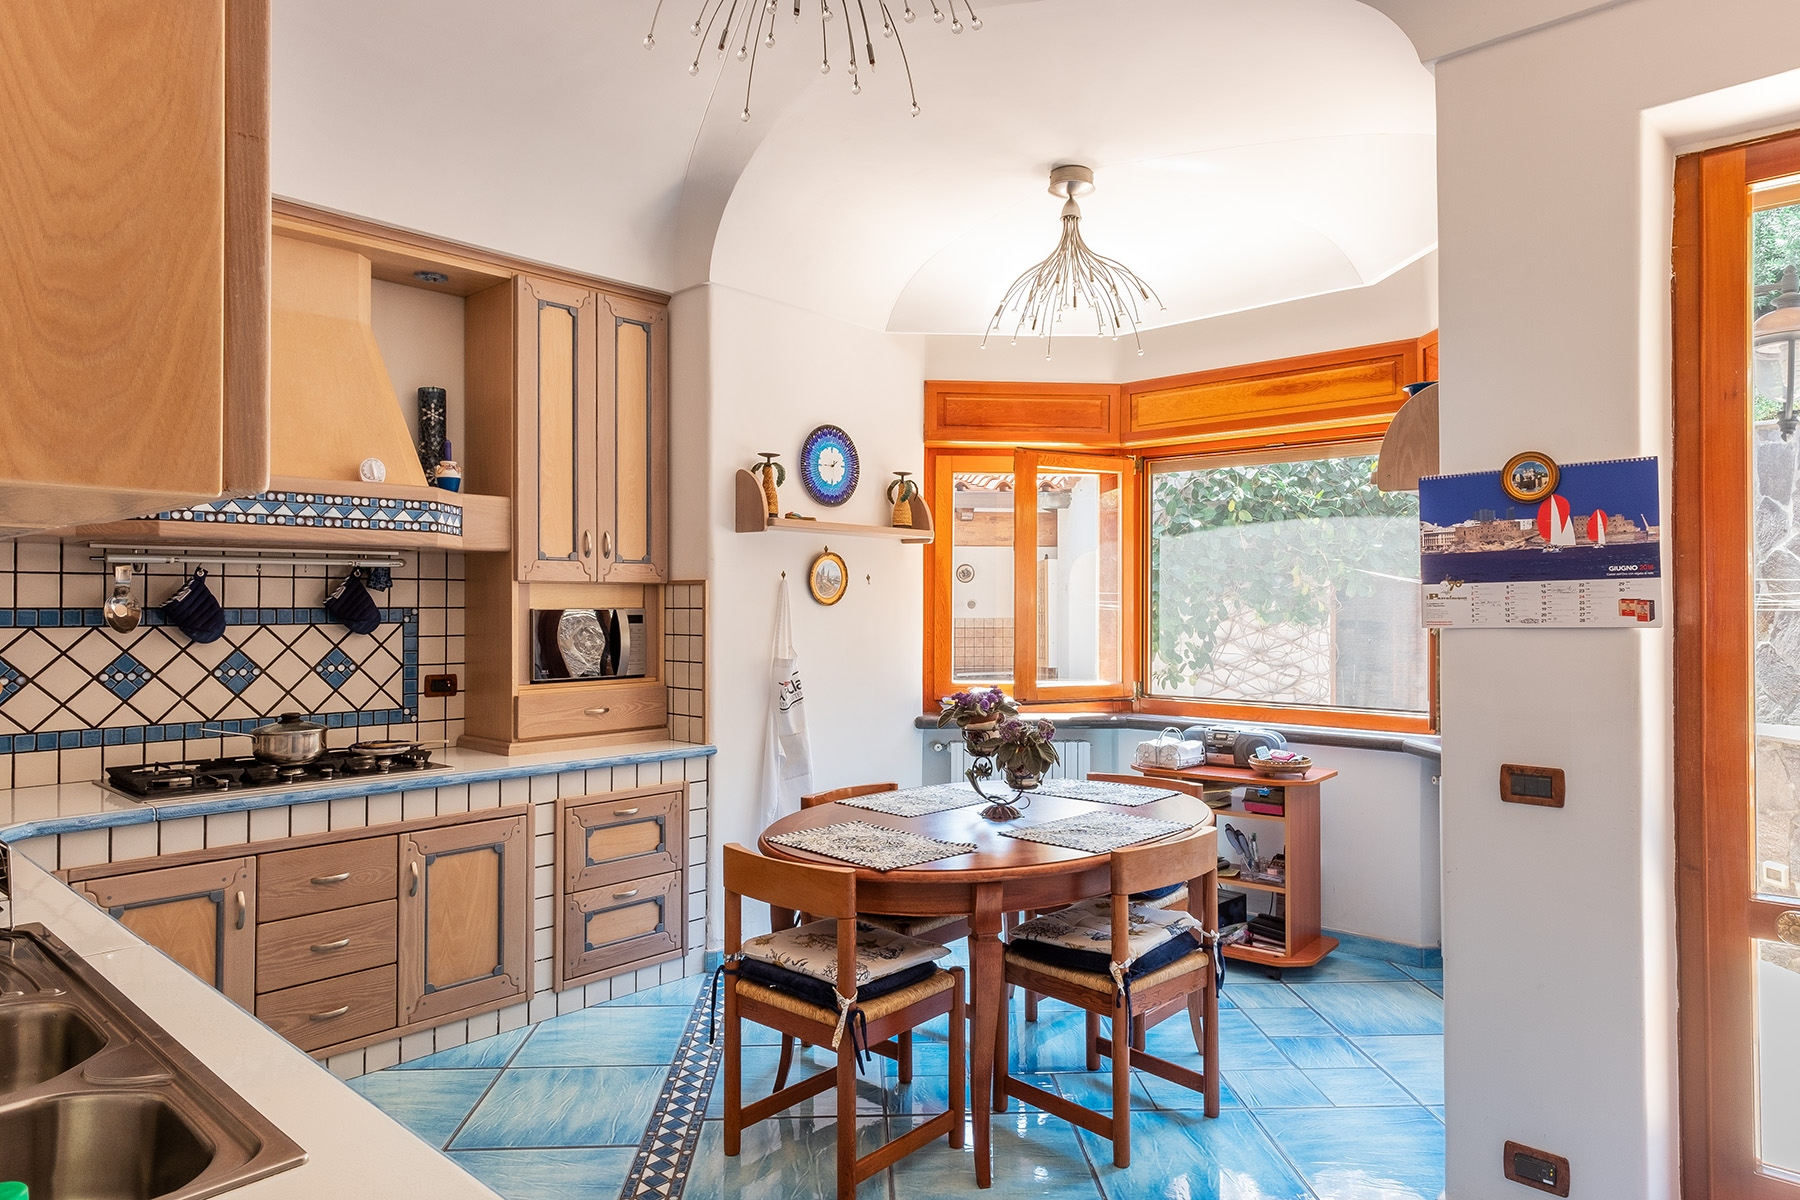 Villa in Vendita a Ischia: 5 locali, 138 mq - Foto 22